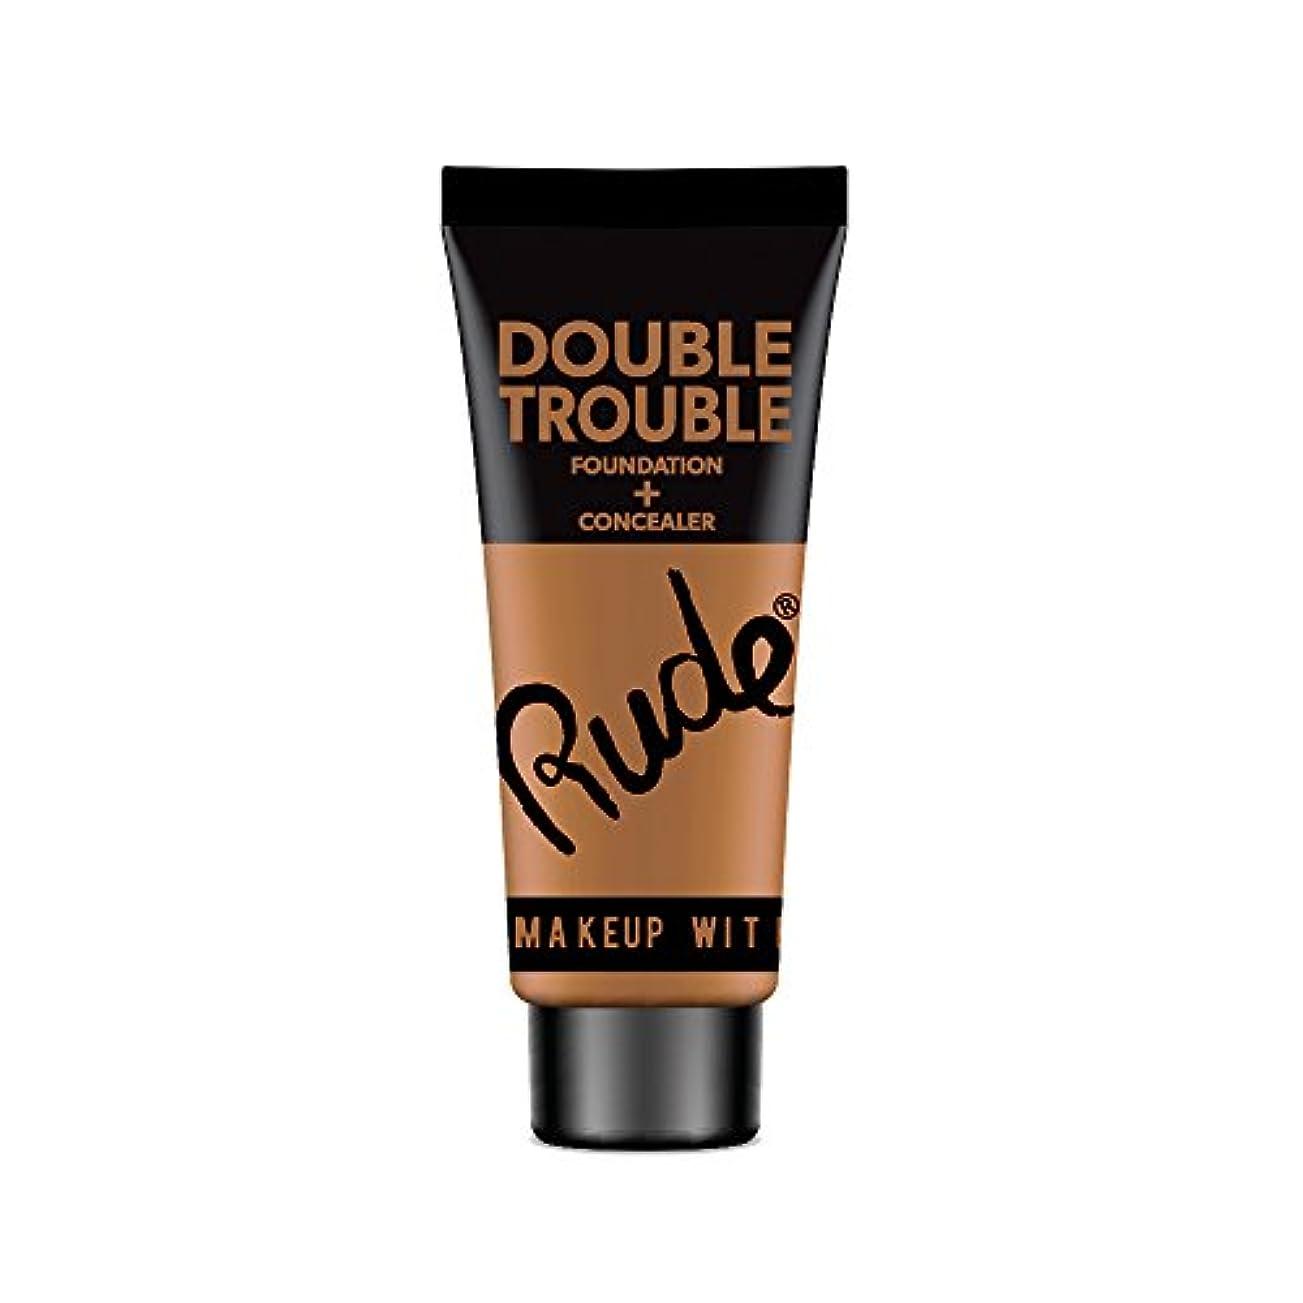 RUDE Double Trouble Foundation + Concealer - Walnut (並行輸入品)